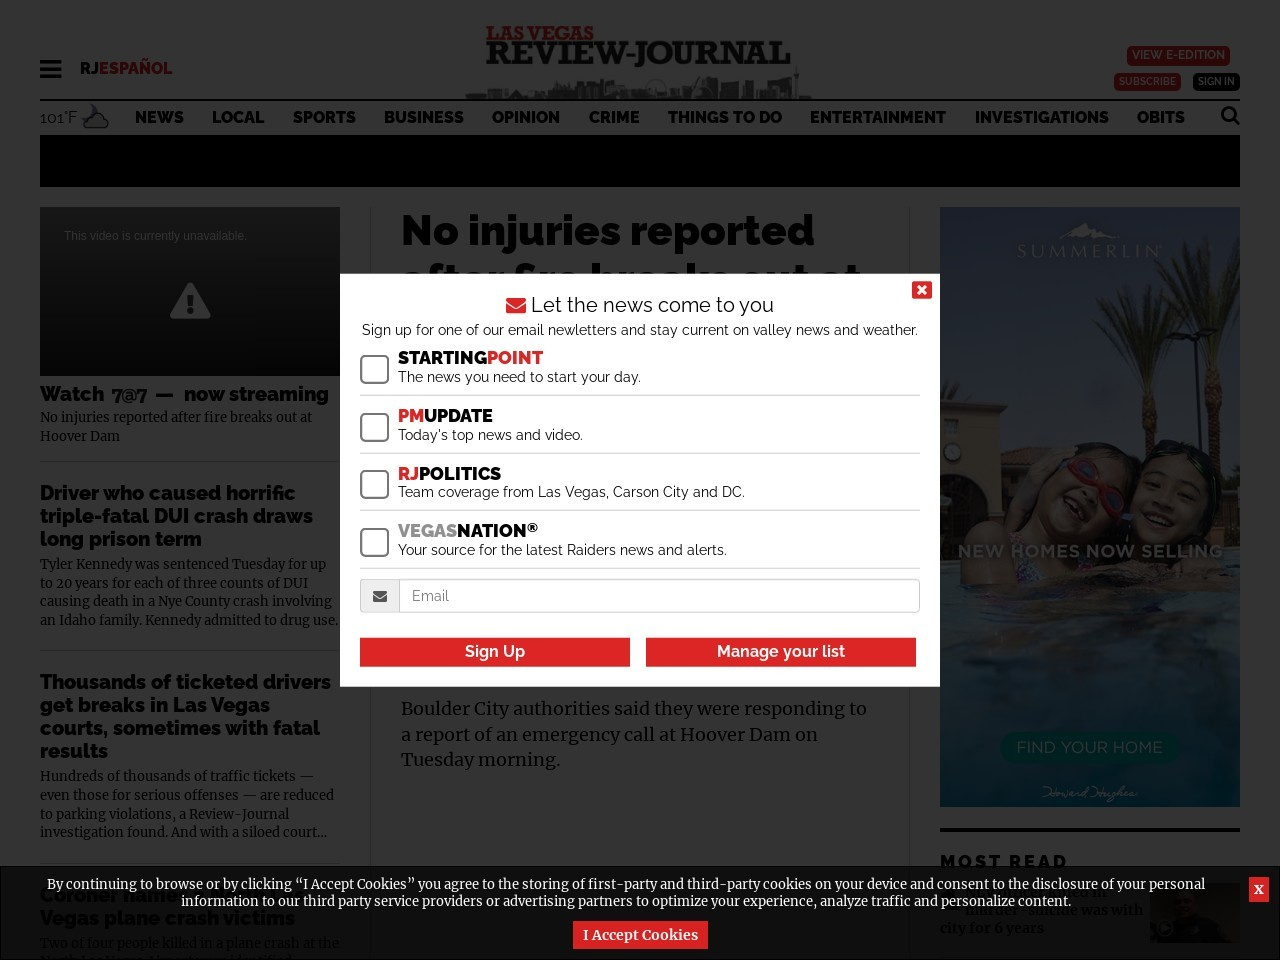 Aerosmith residency leads April's top concerts in Las Vegas